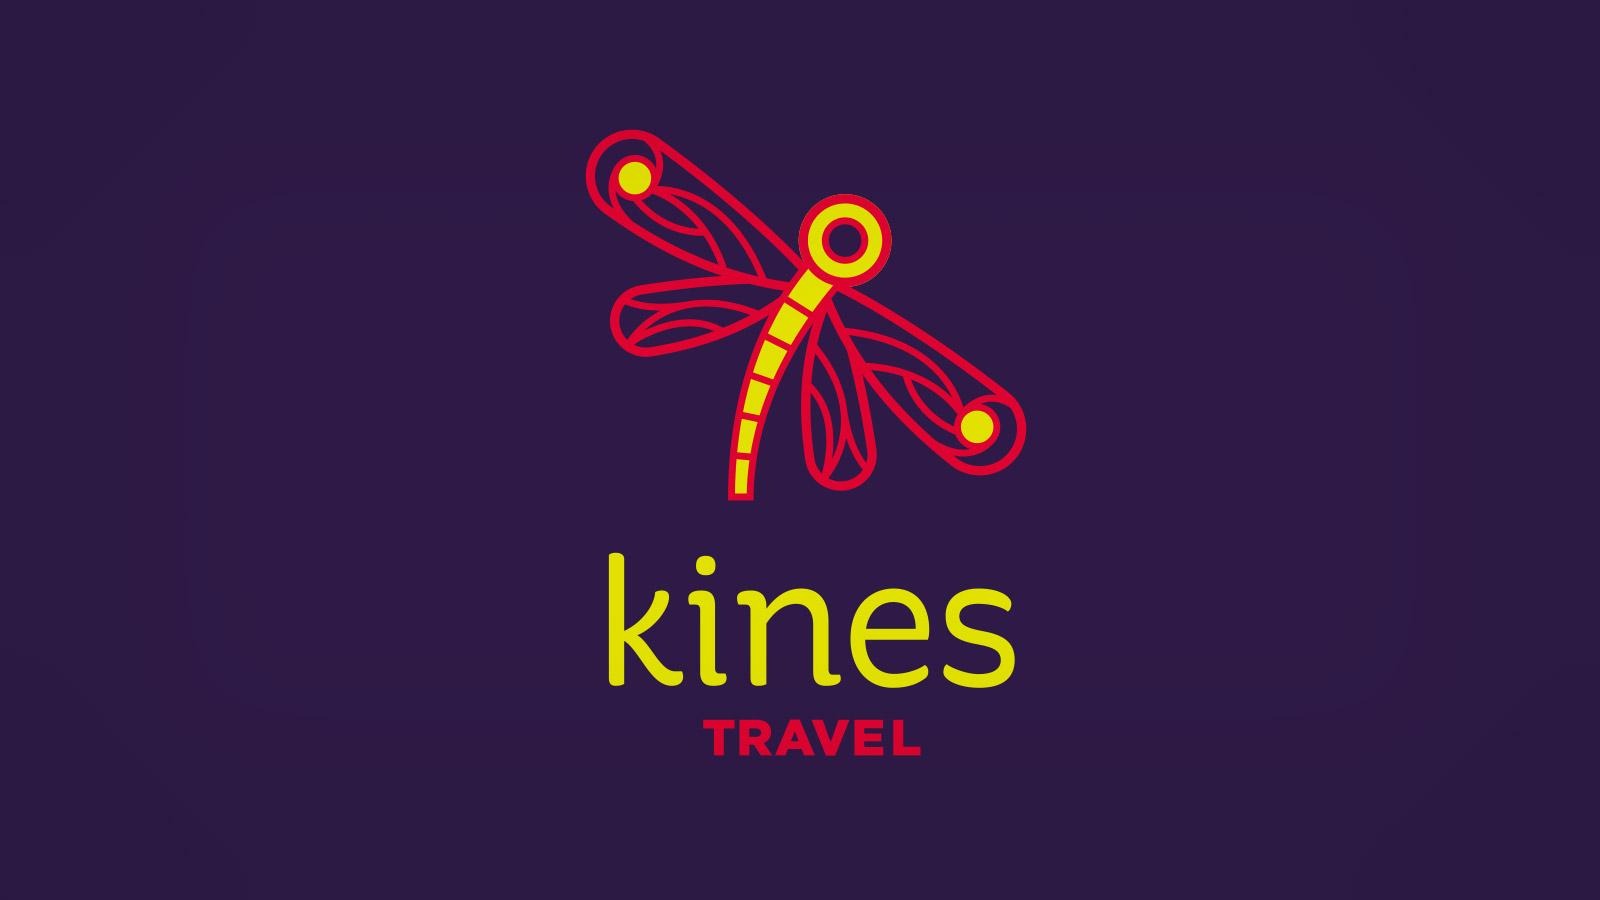 Kines Travel